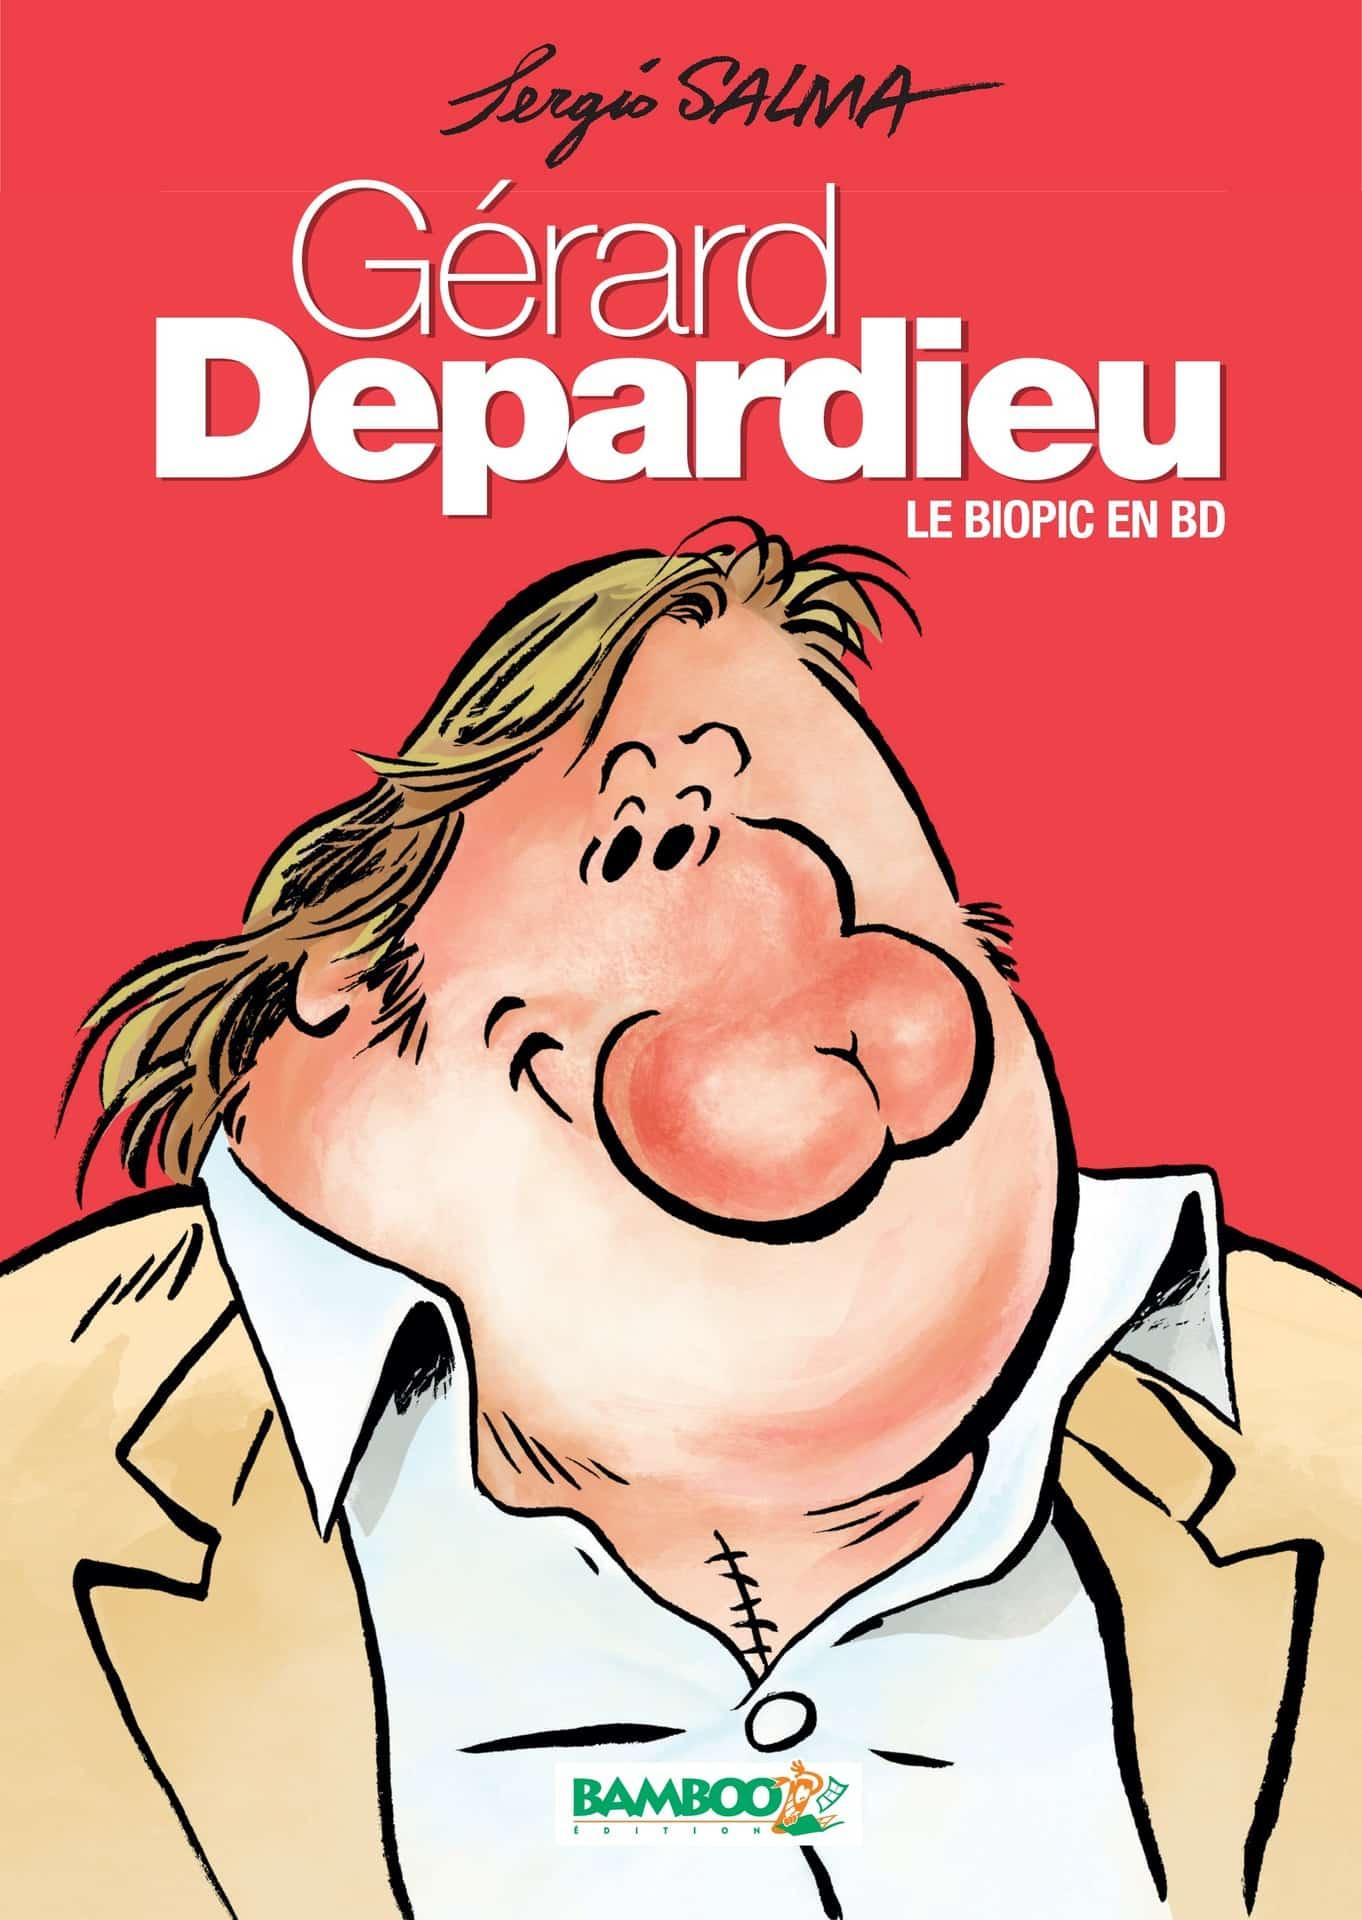 Gérard Depardieu, un héros de BD